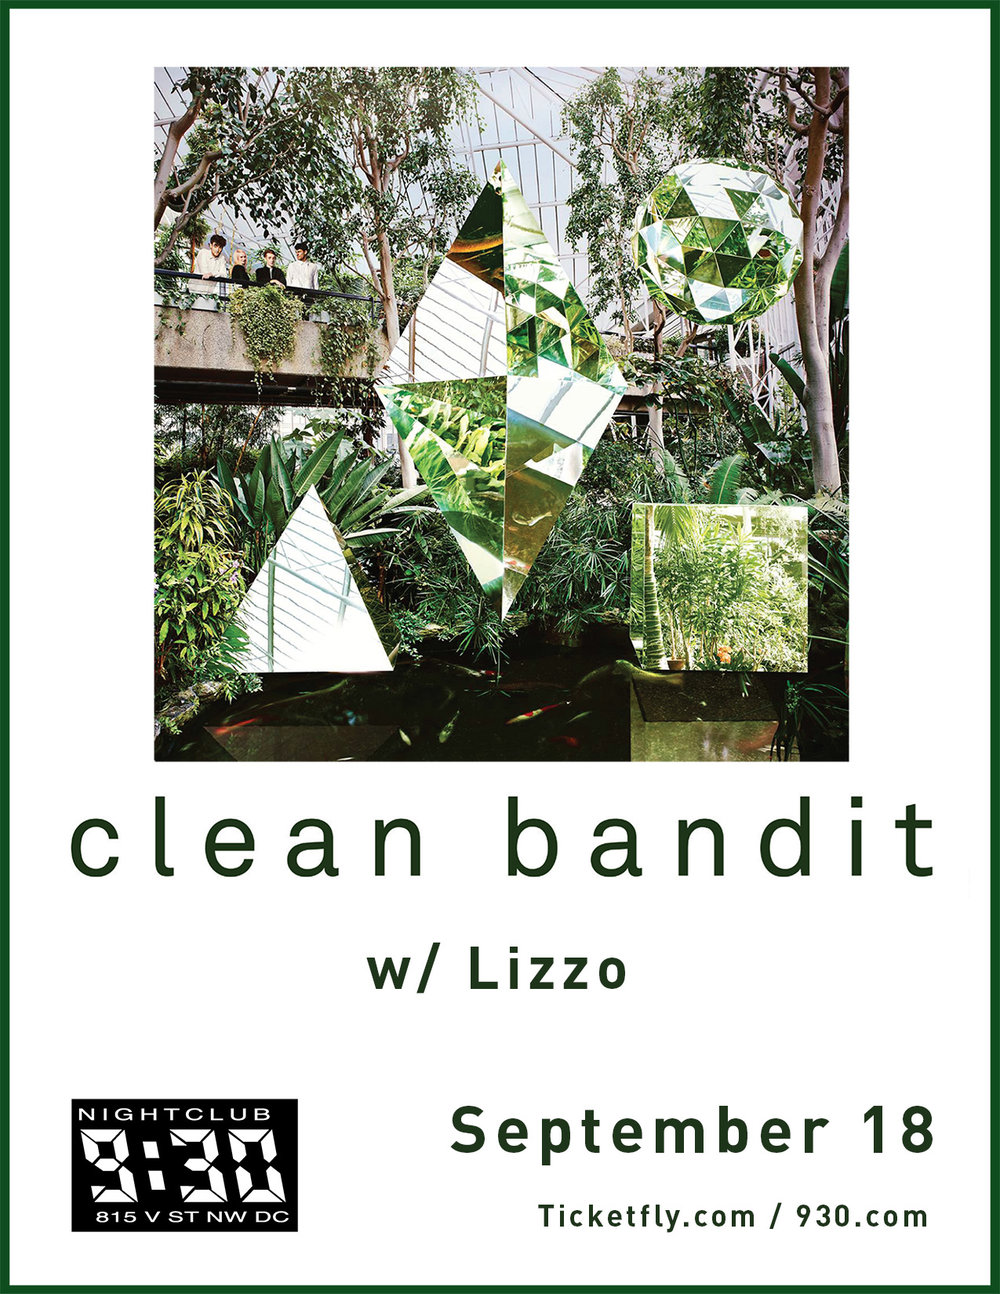 CleanBanditF.jpg